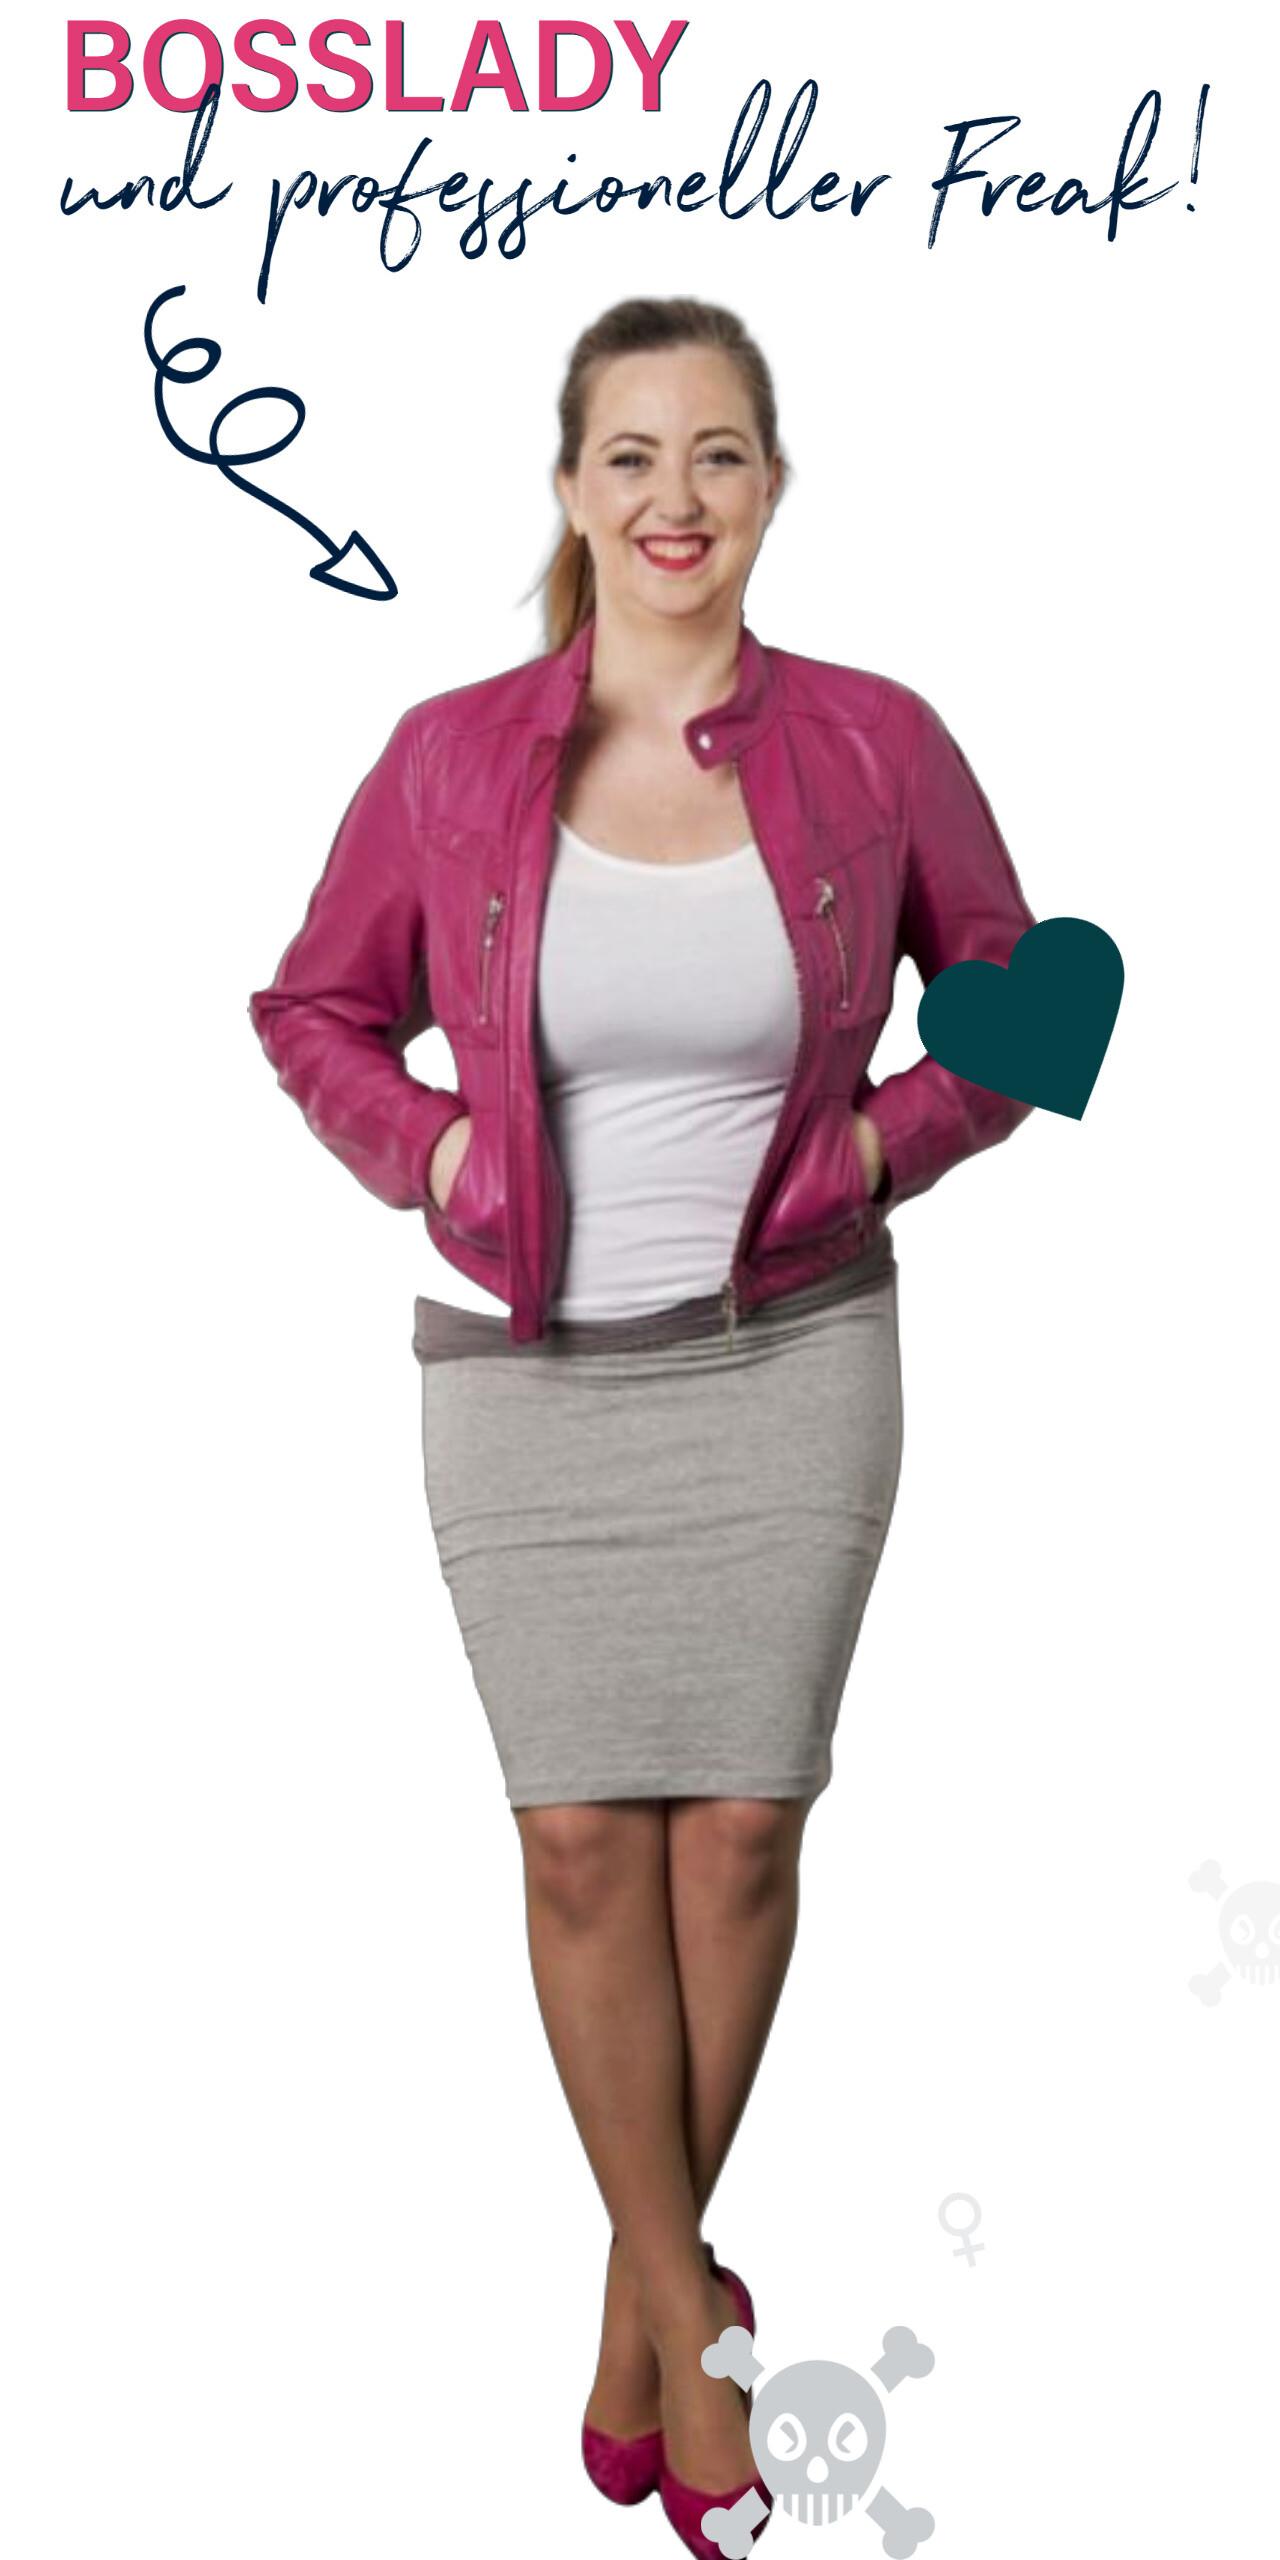 barbara lampl feminist economy ceo female coaching consulting training feministasfuck bosslady